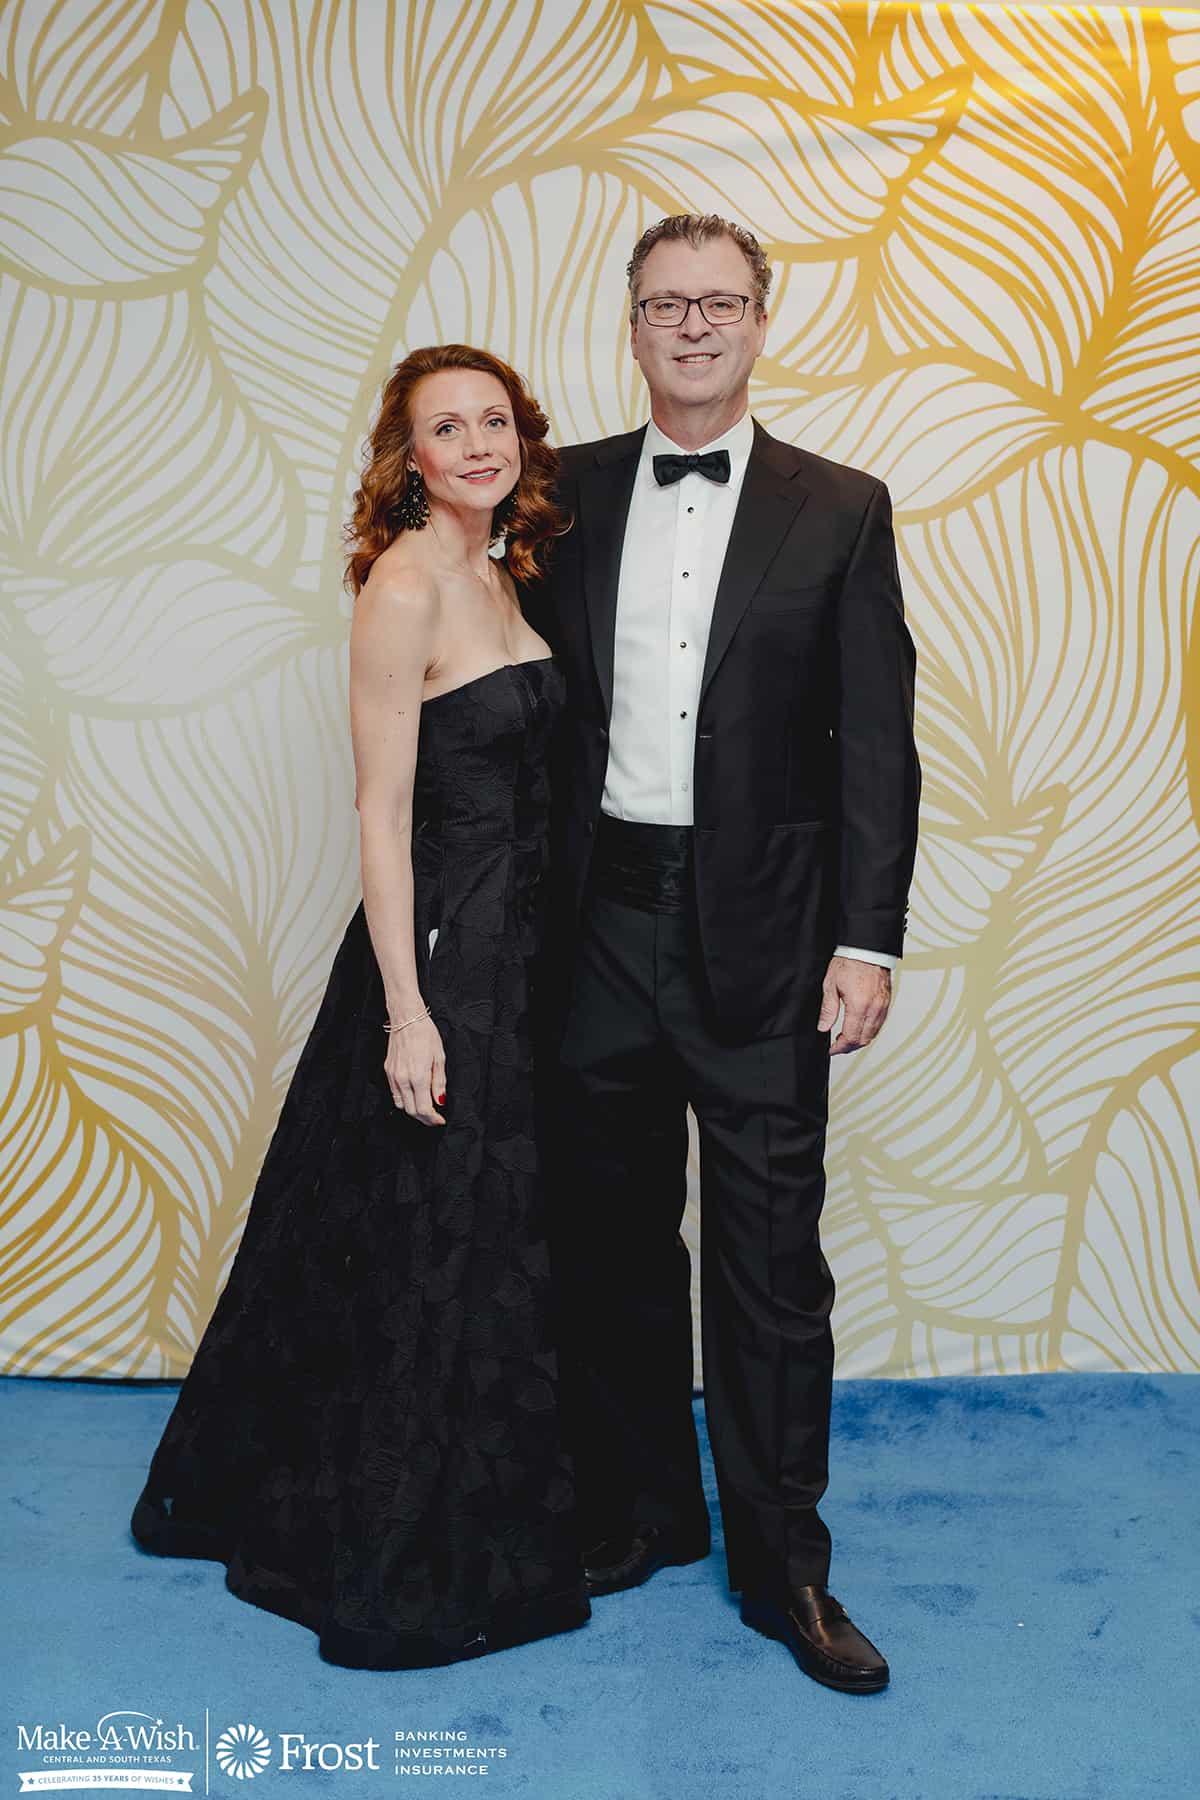 Andrea Bullock and David Roberts